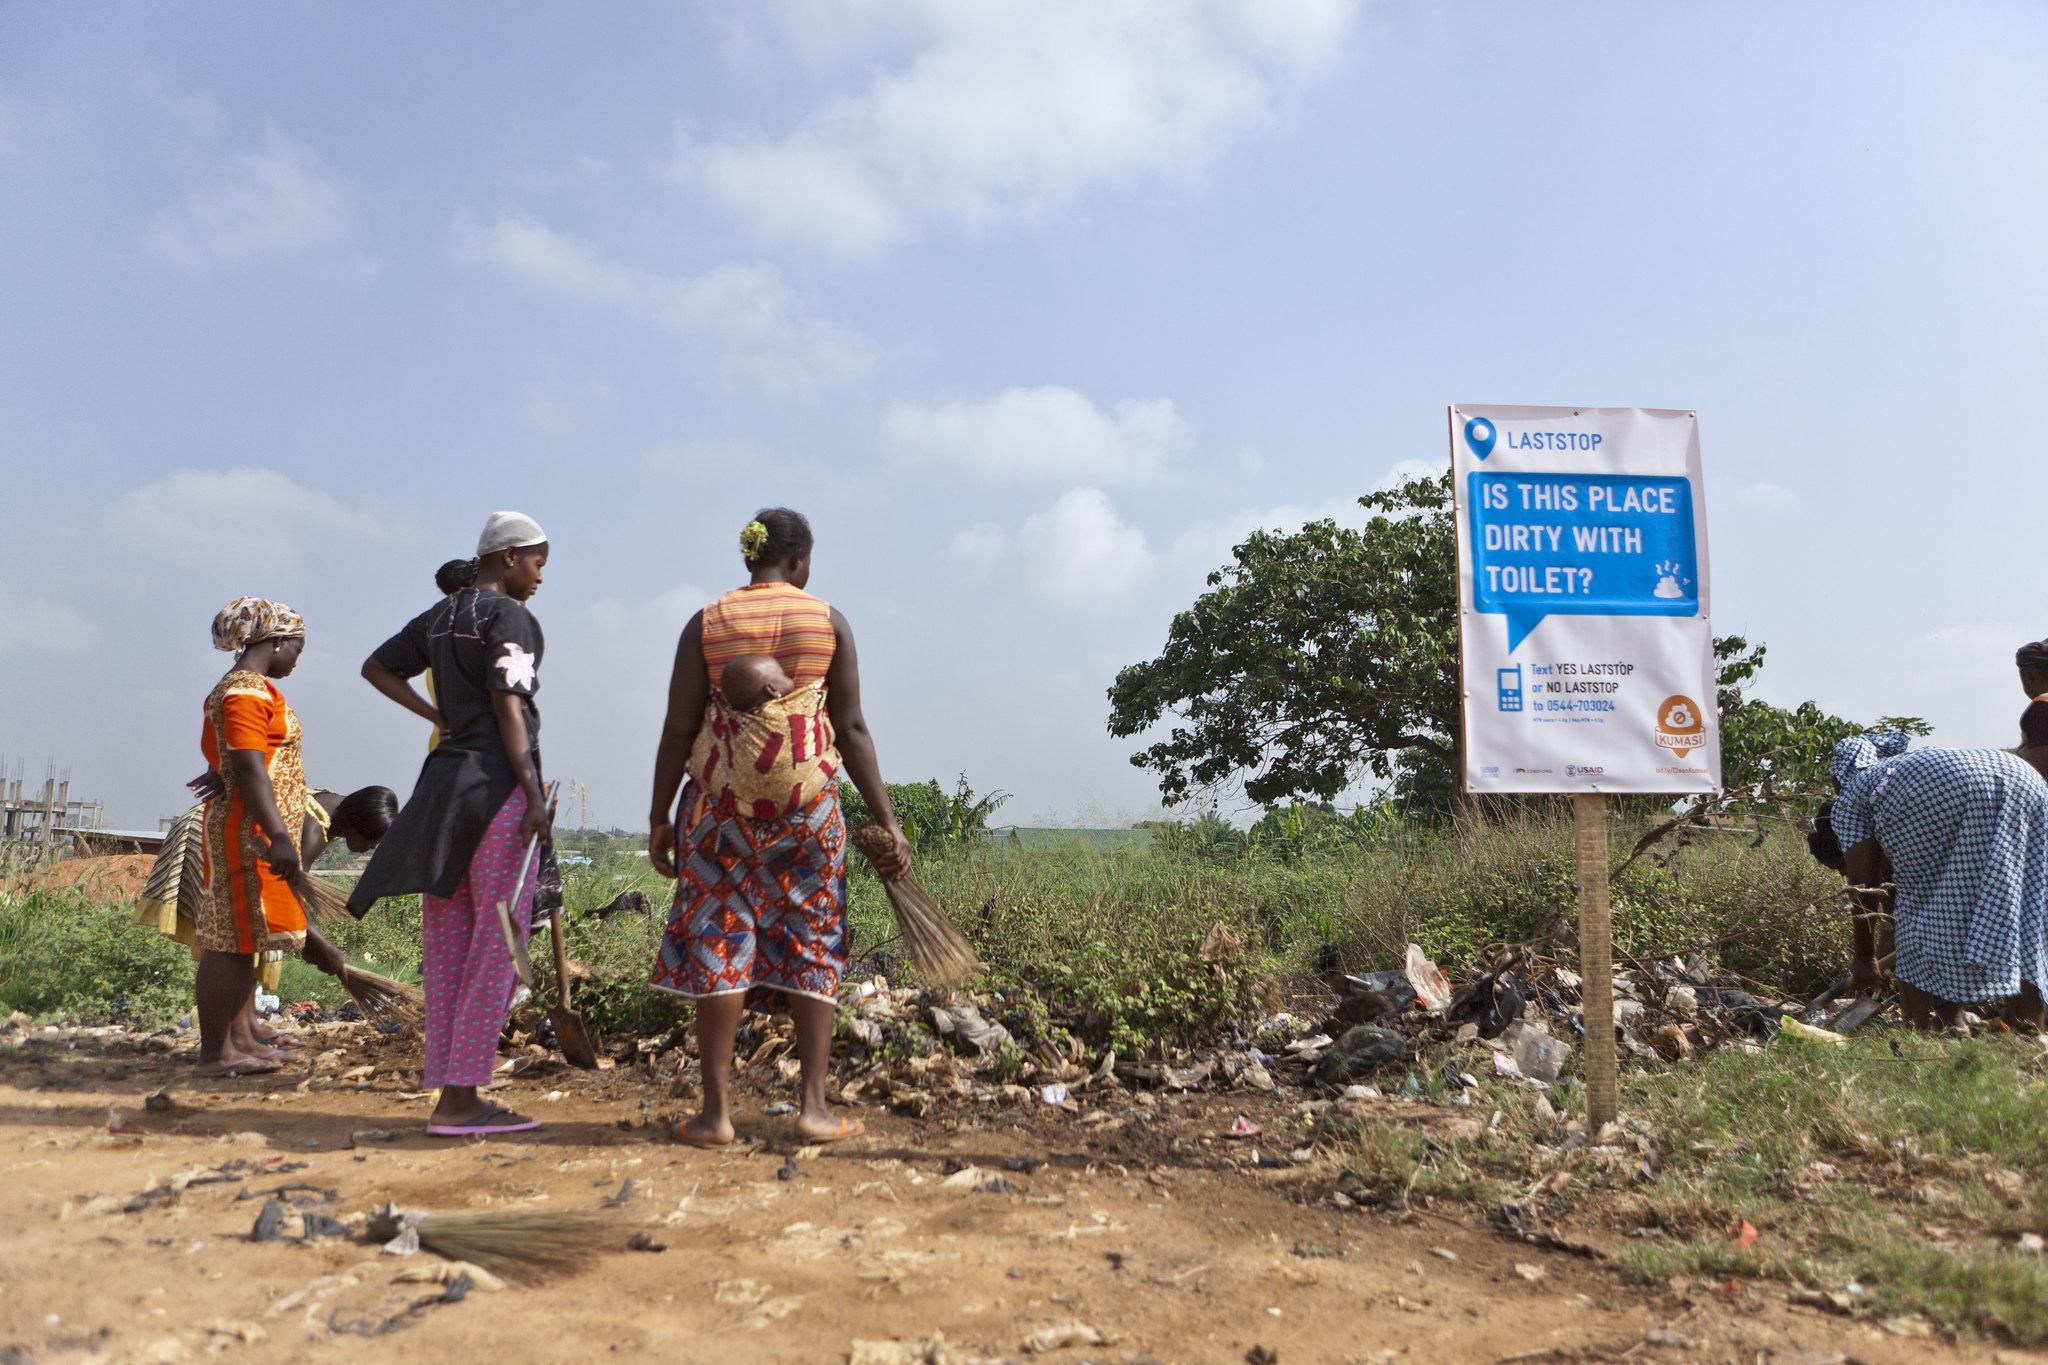 Slums in Ghana